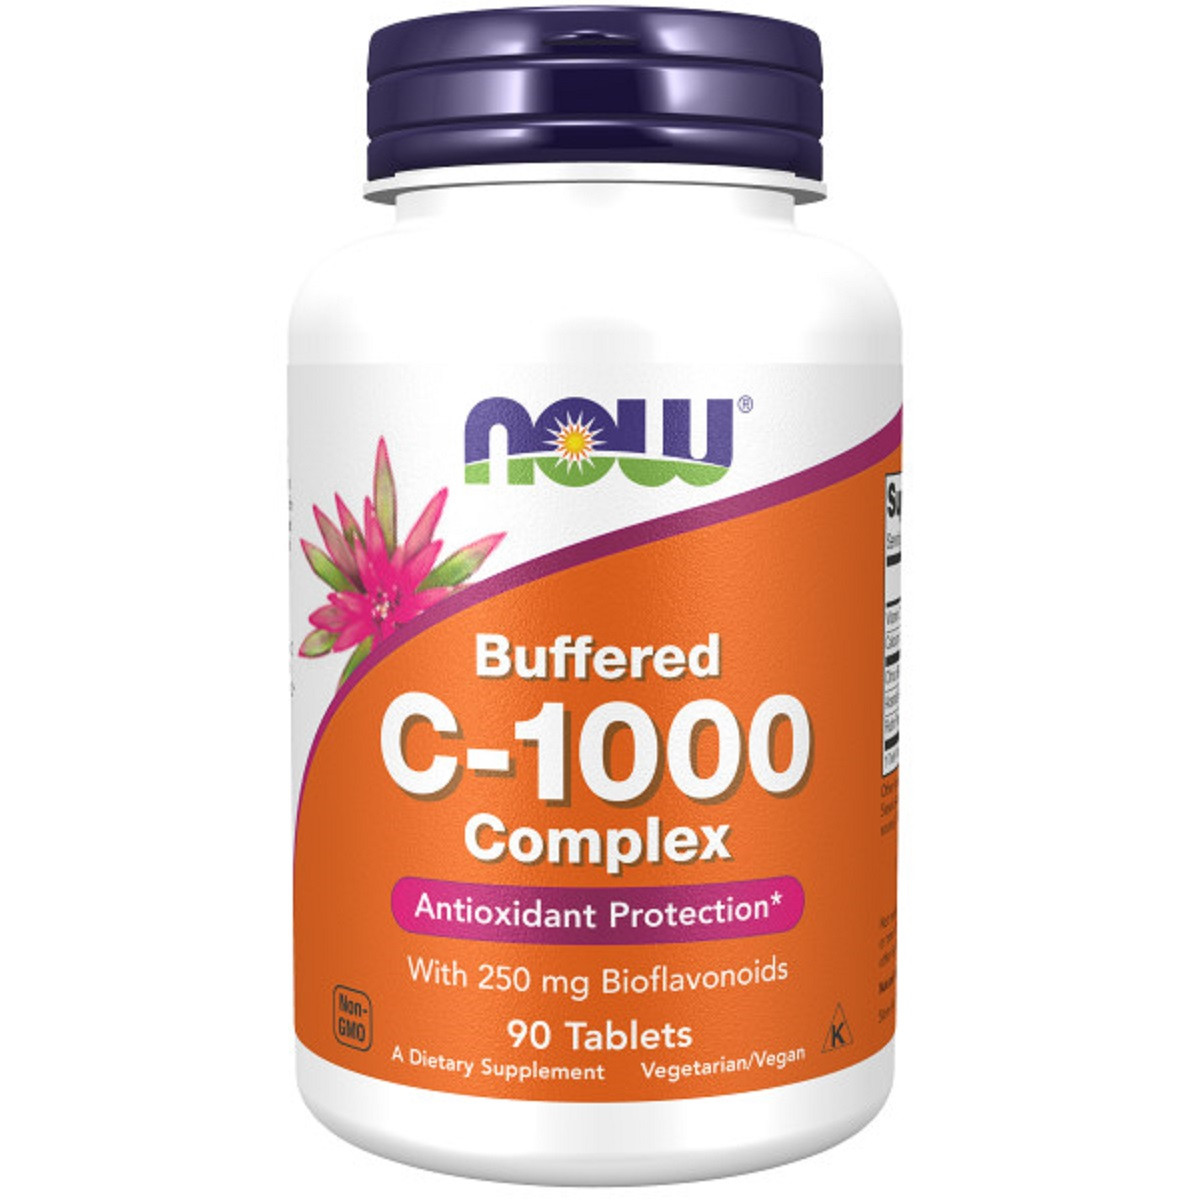 Комплекс Витамина C-1000, с 250 мг биофлавоноидов, Complex C-1000 With 250 mg of Bioflavonoids, Now Foods, 90